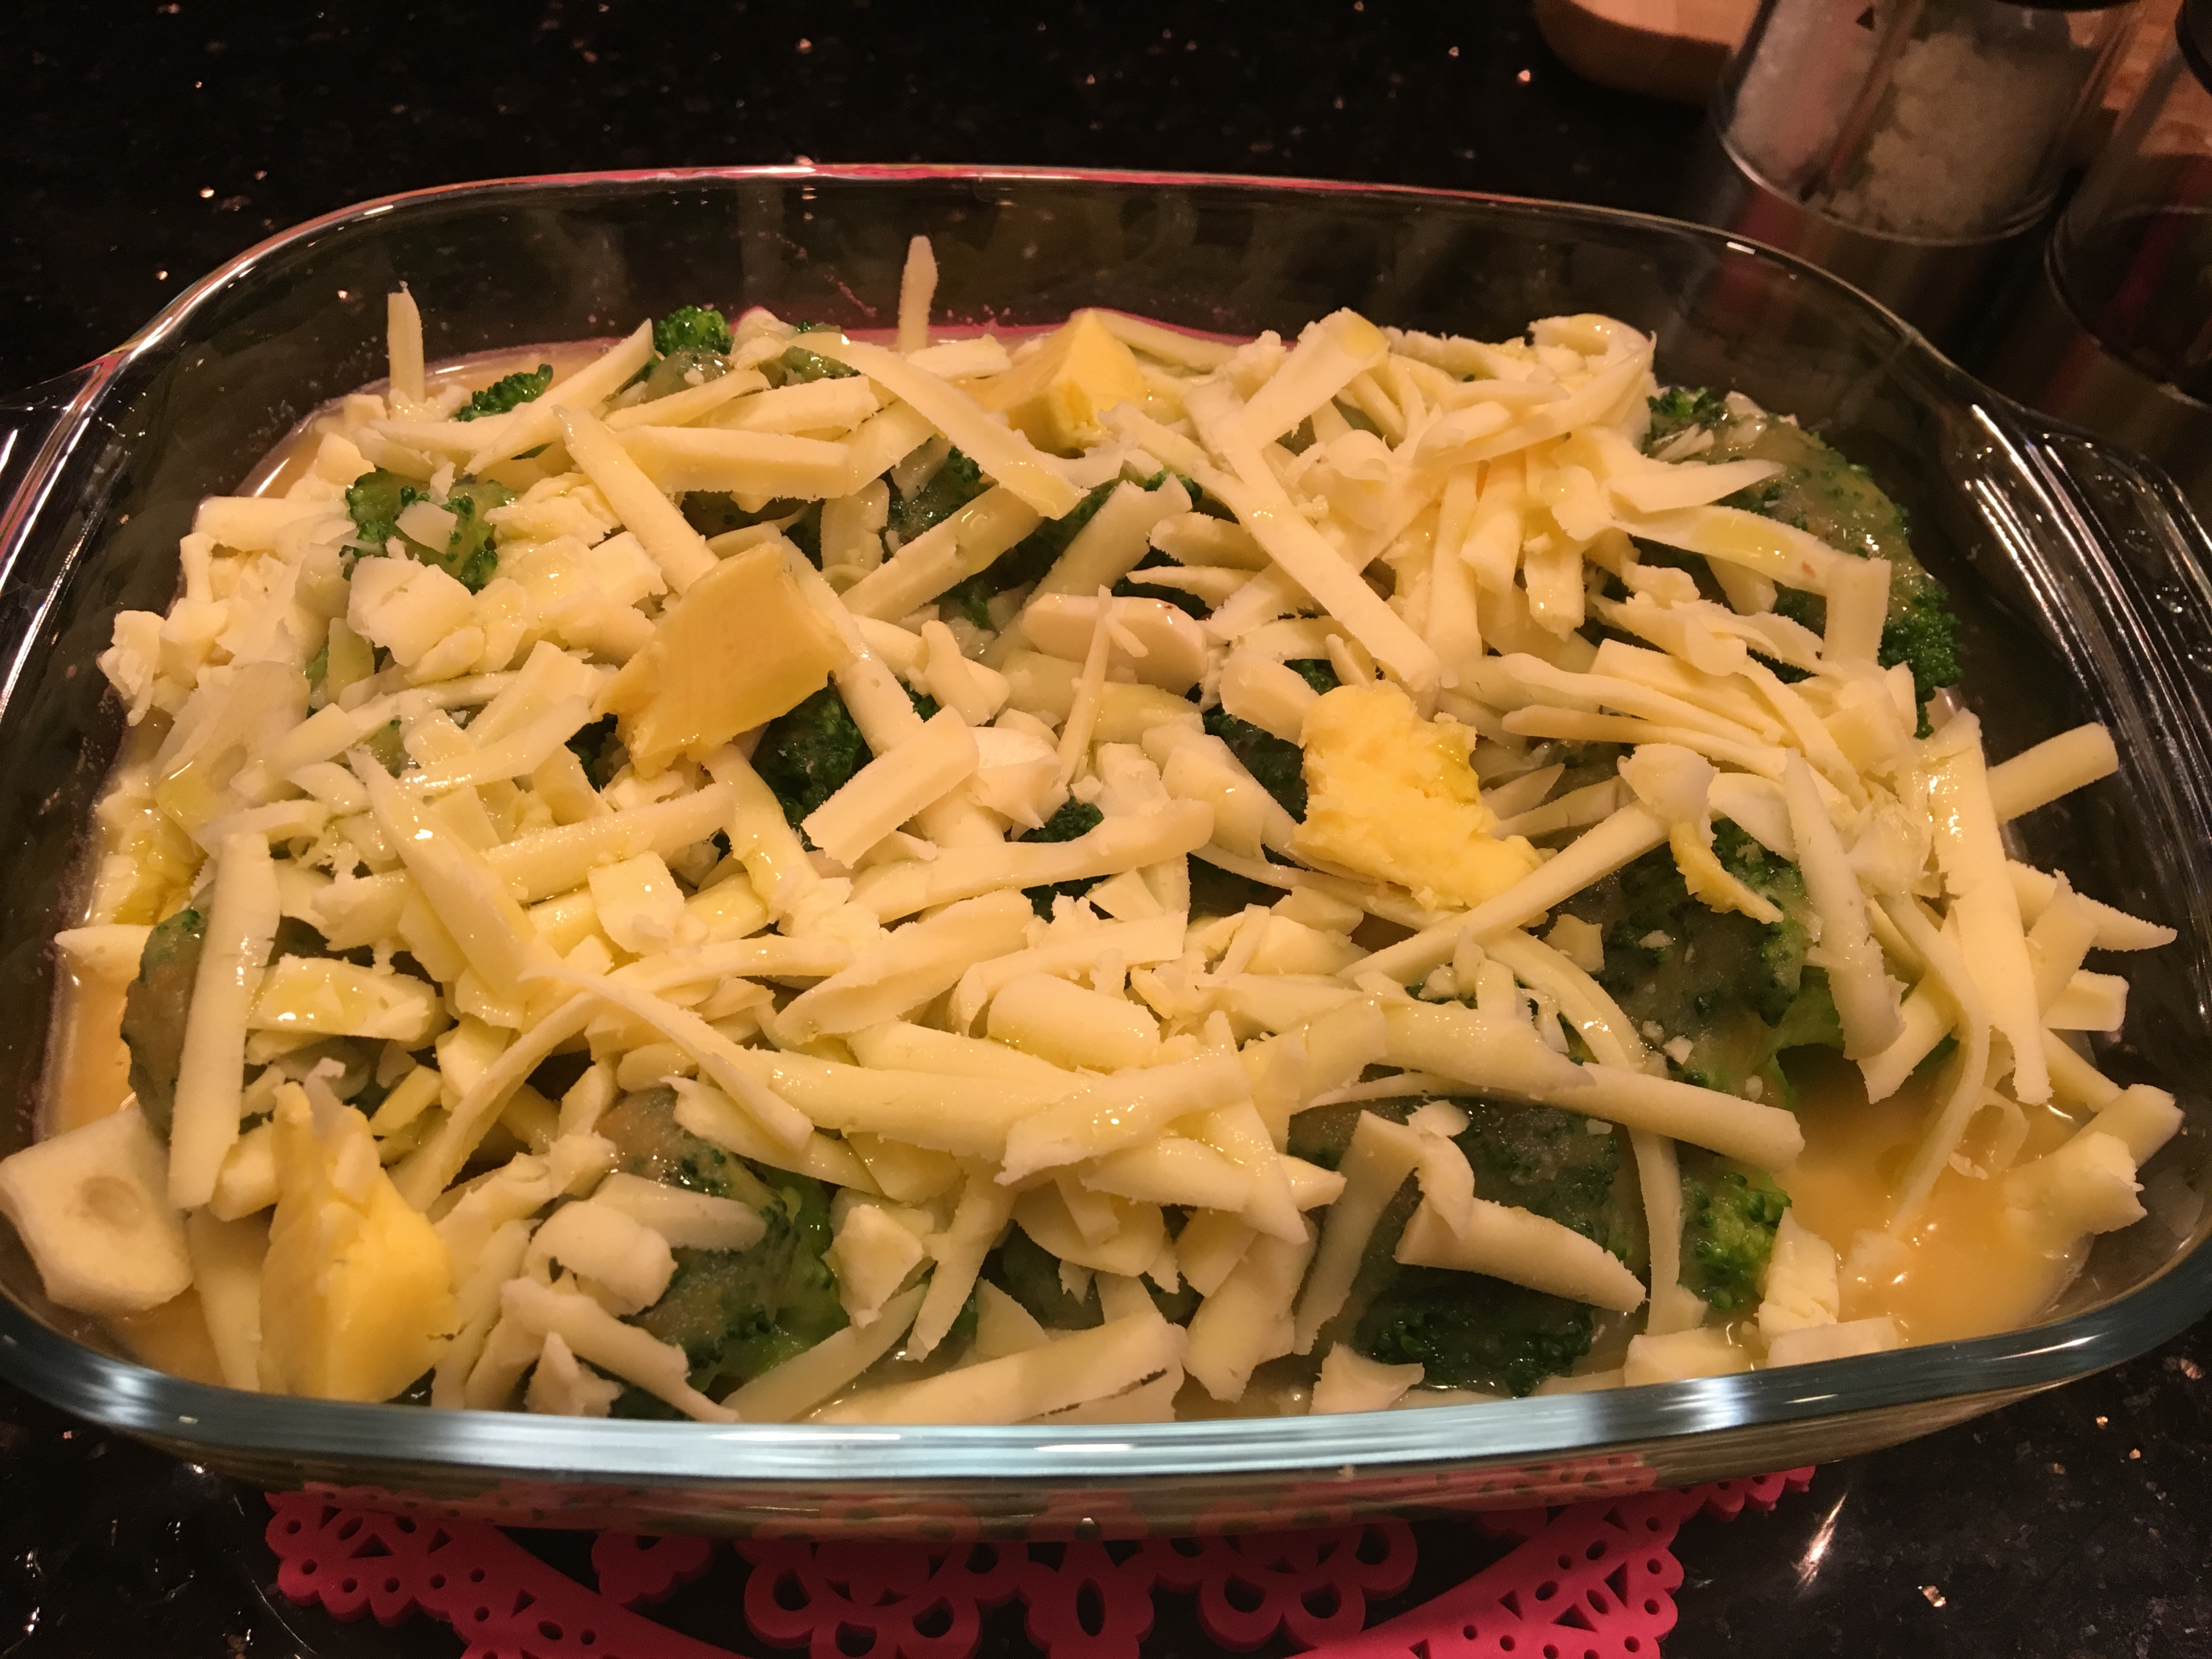 Fırında Tavuklu Kaşarlı Brokoli Tarifi